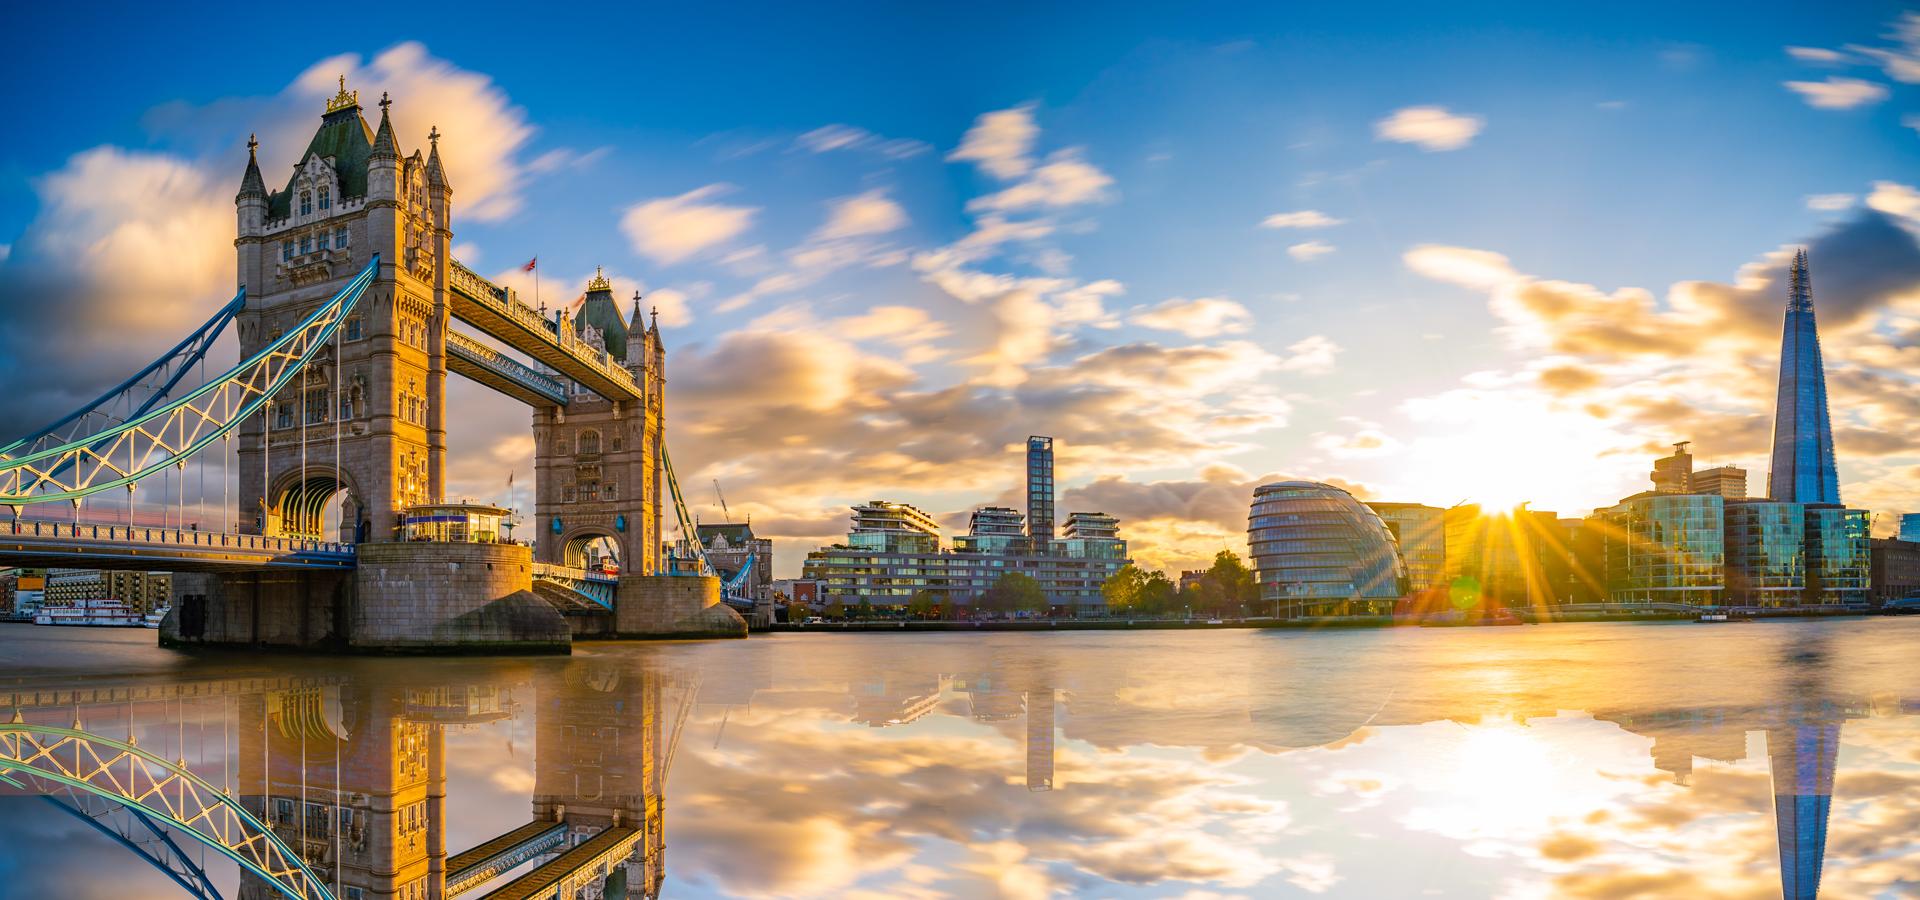 <b>Europe/London/England</b>